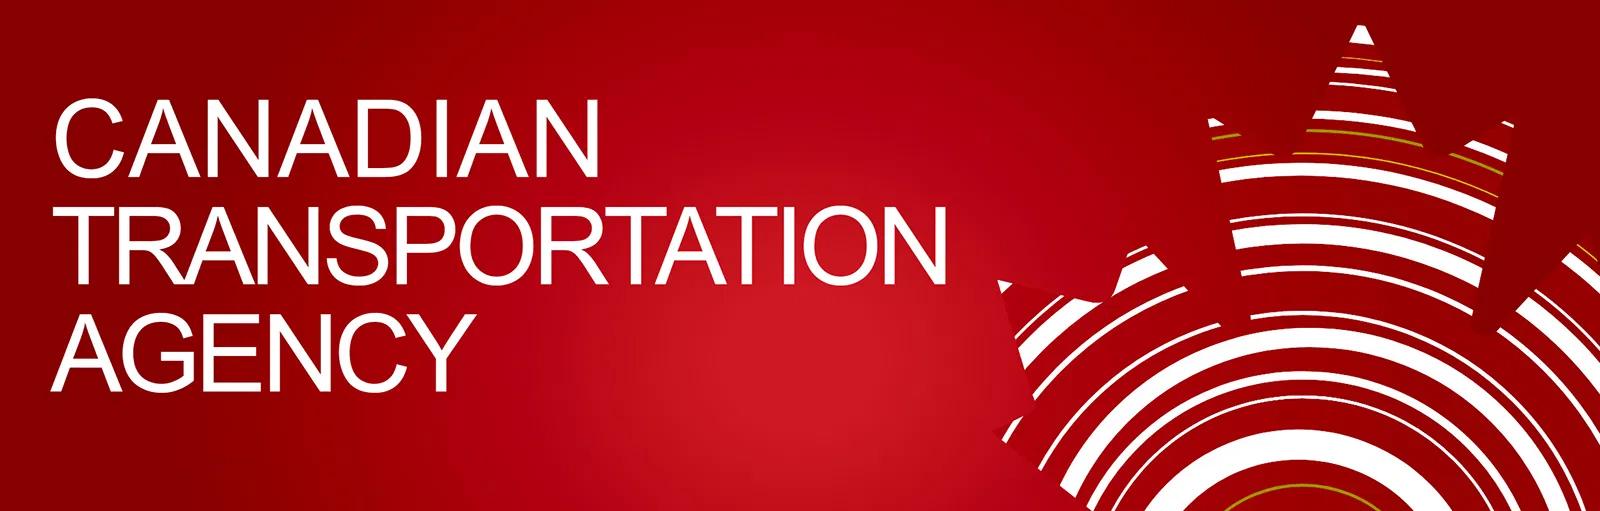 Canadian Transportation Agency logo.